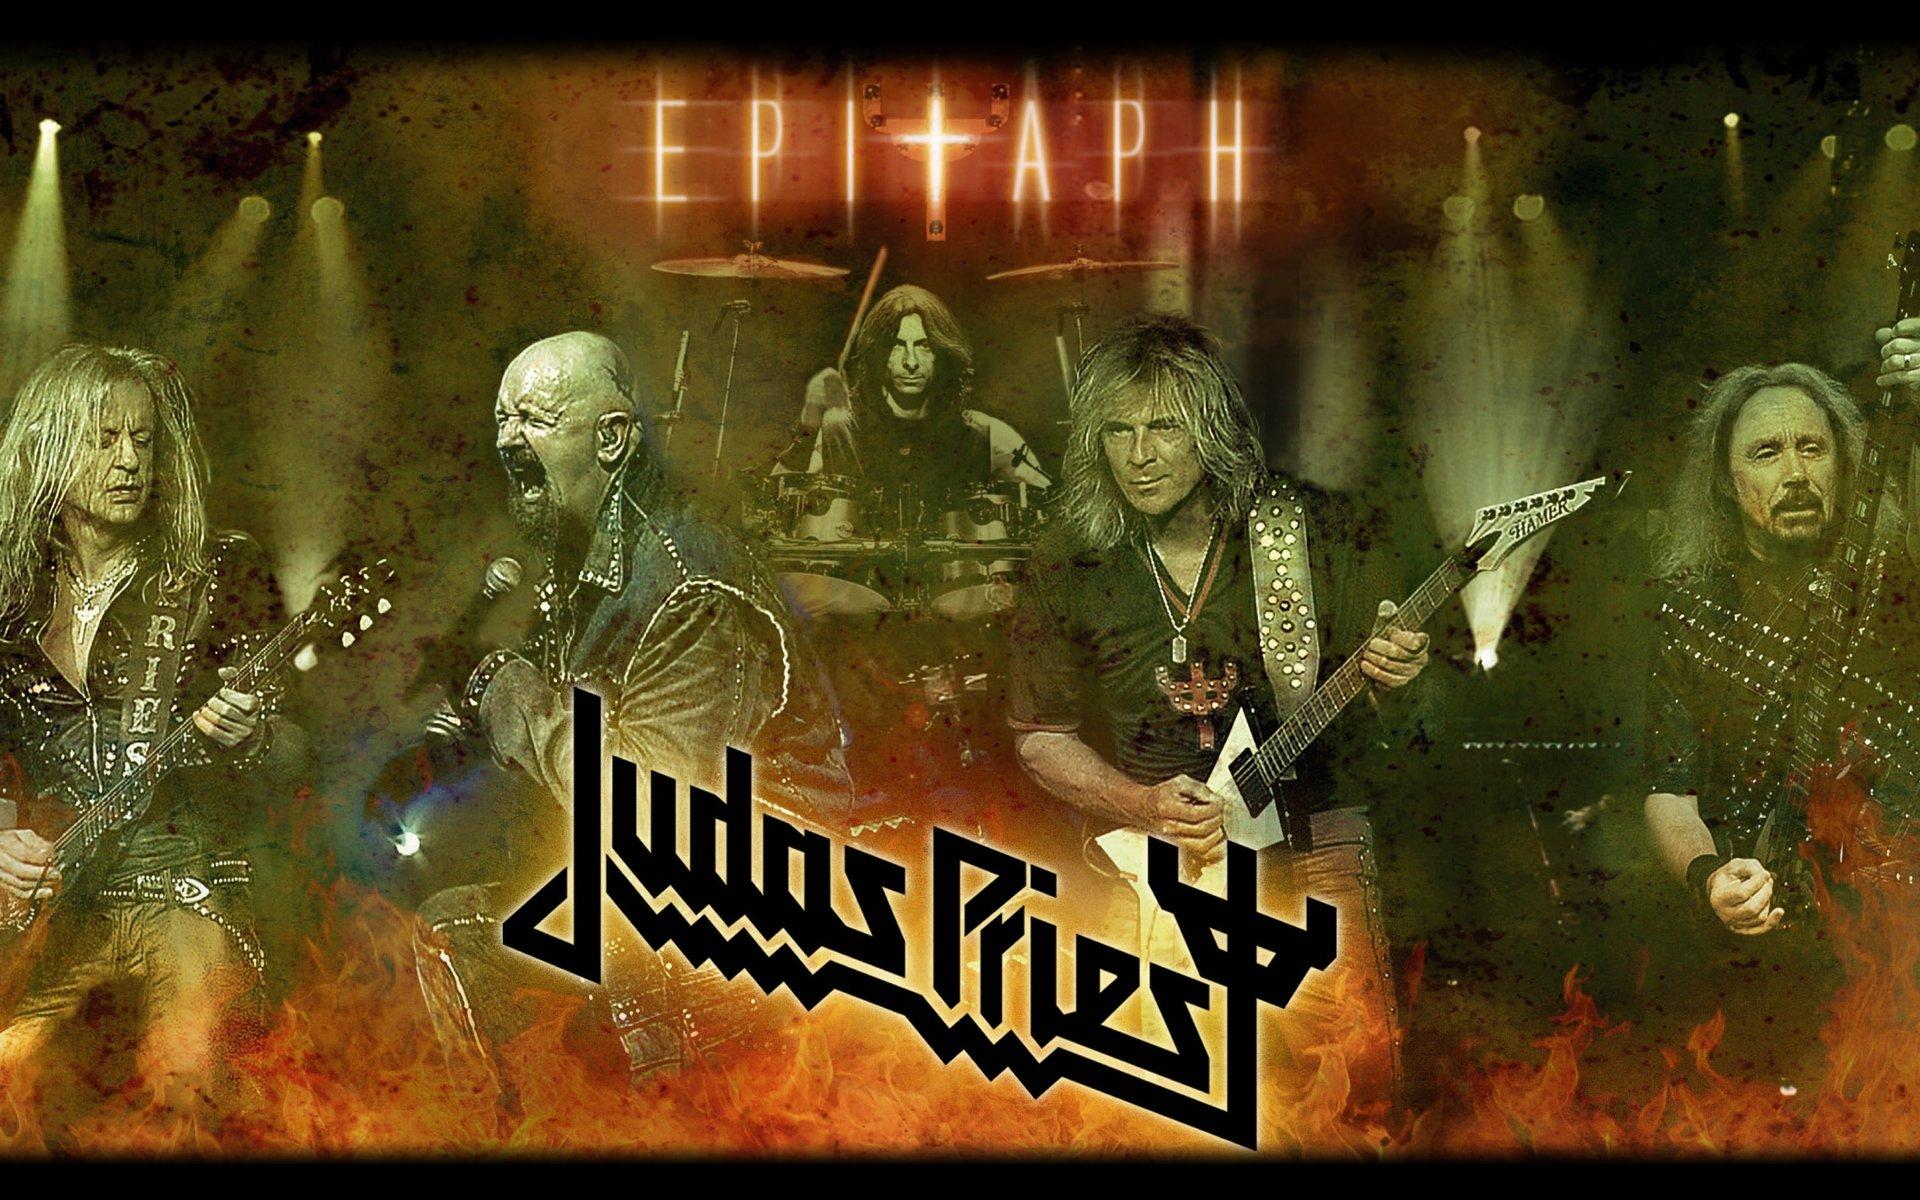 High Resolution Judas Priest Hd 1920x1200 Wallpaper Id